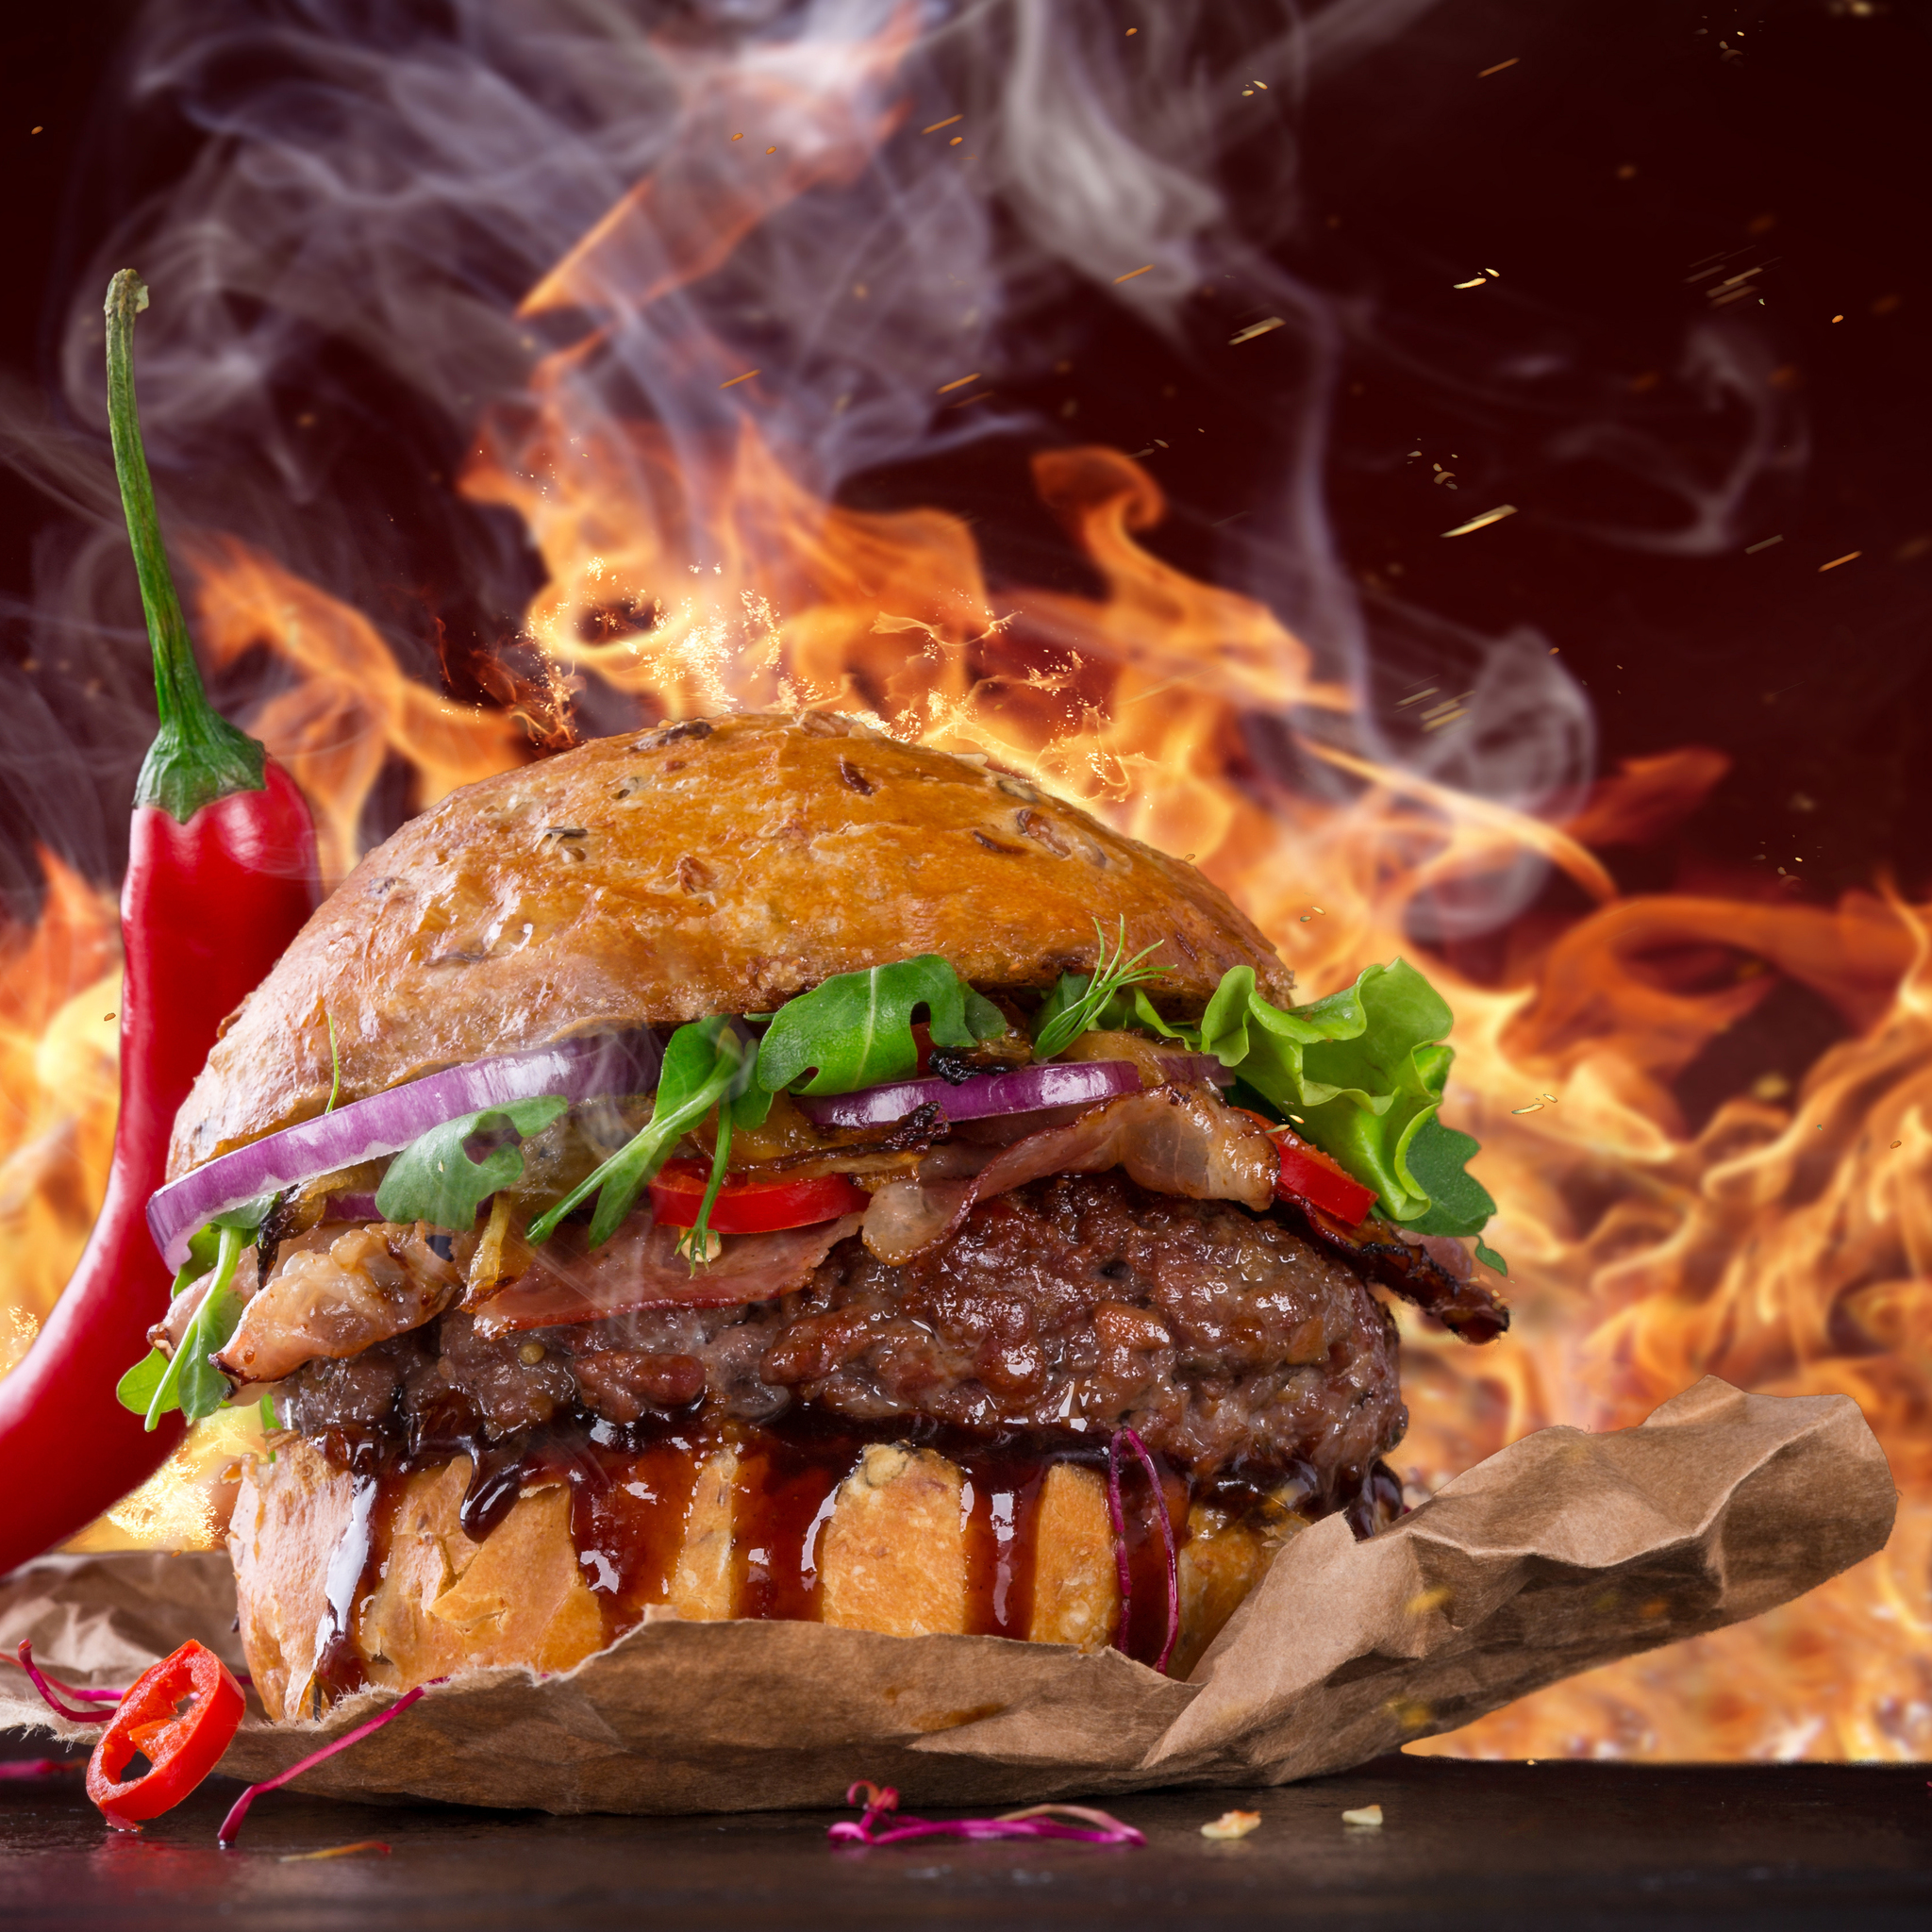 2048x2048 Hot Spicy Burger Ipad Air HD 4k Wallpapers